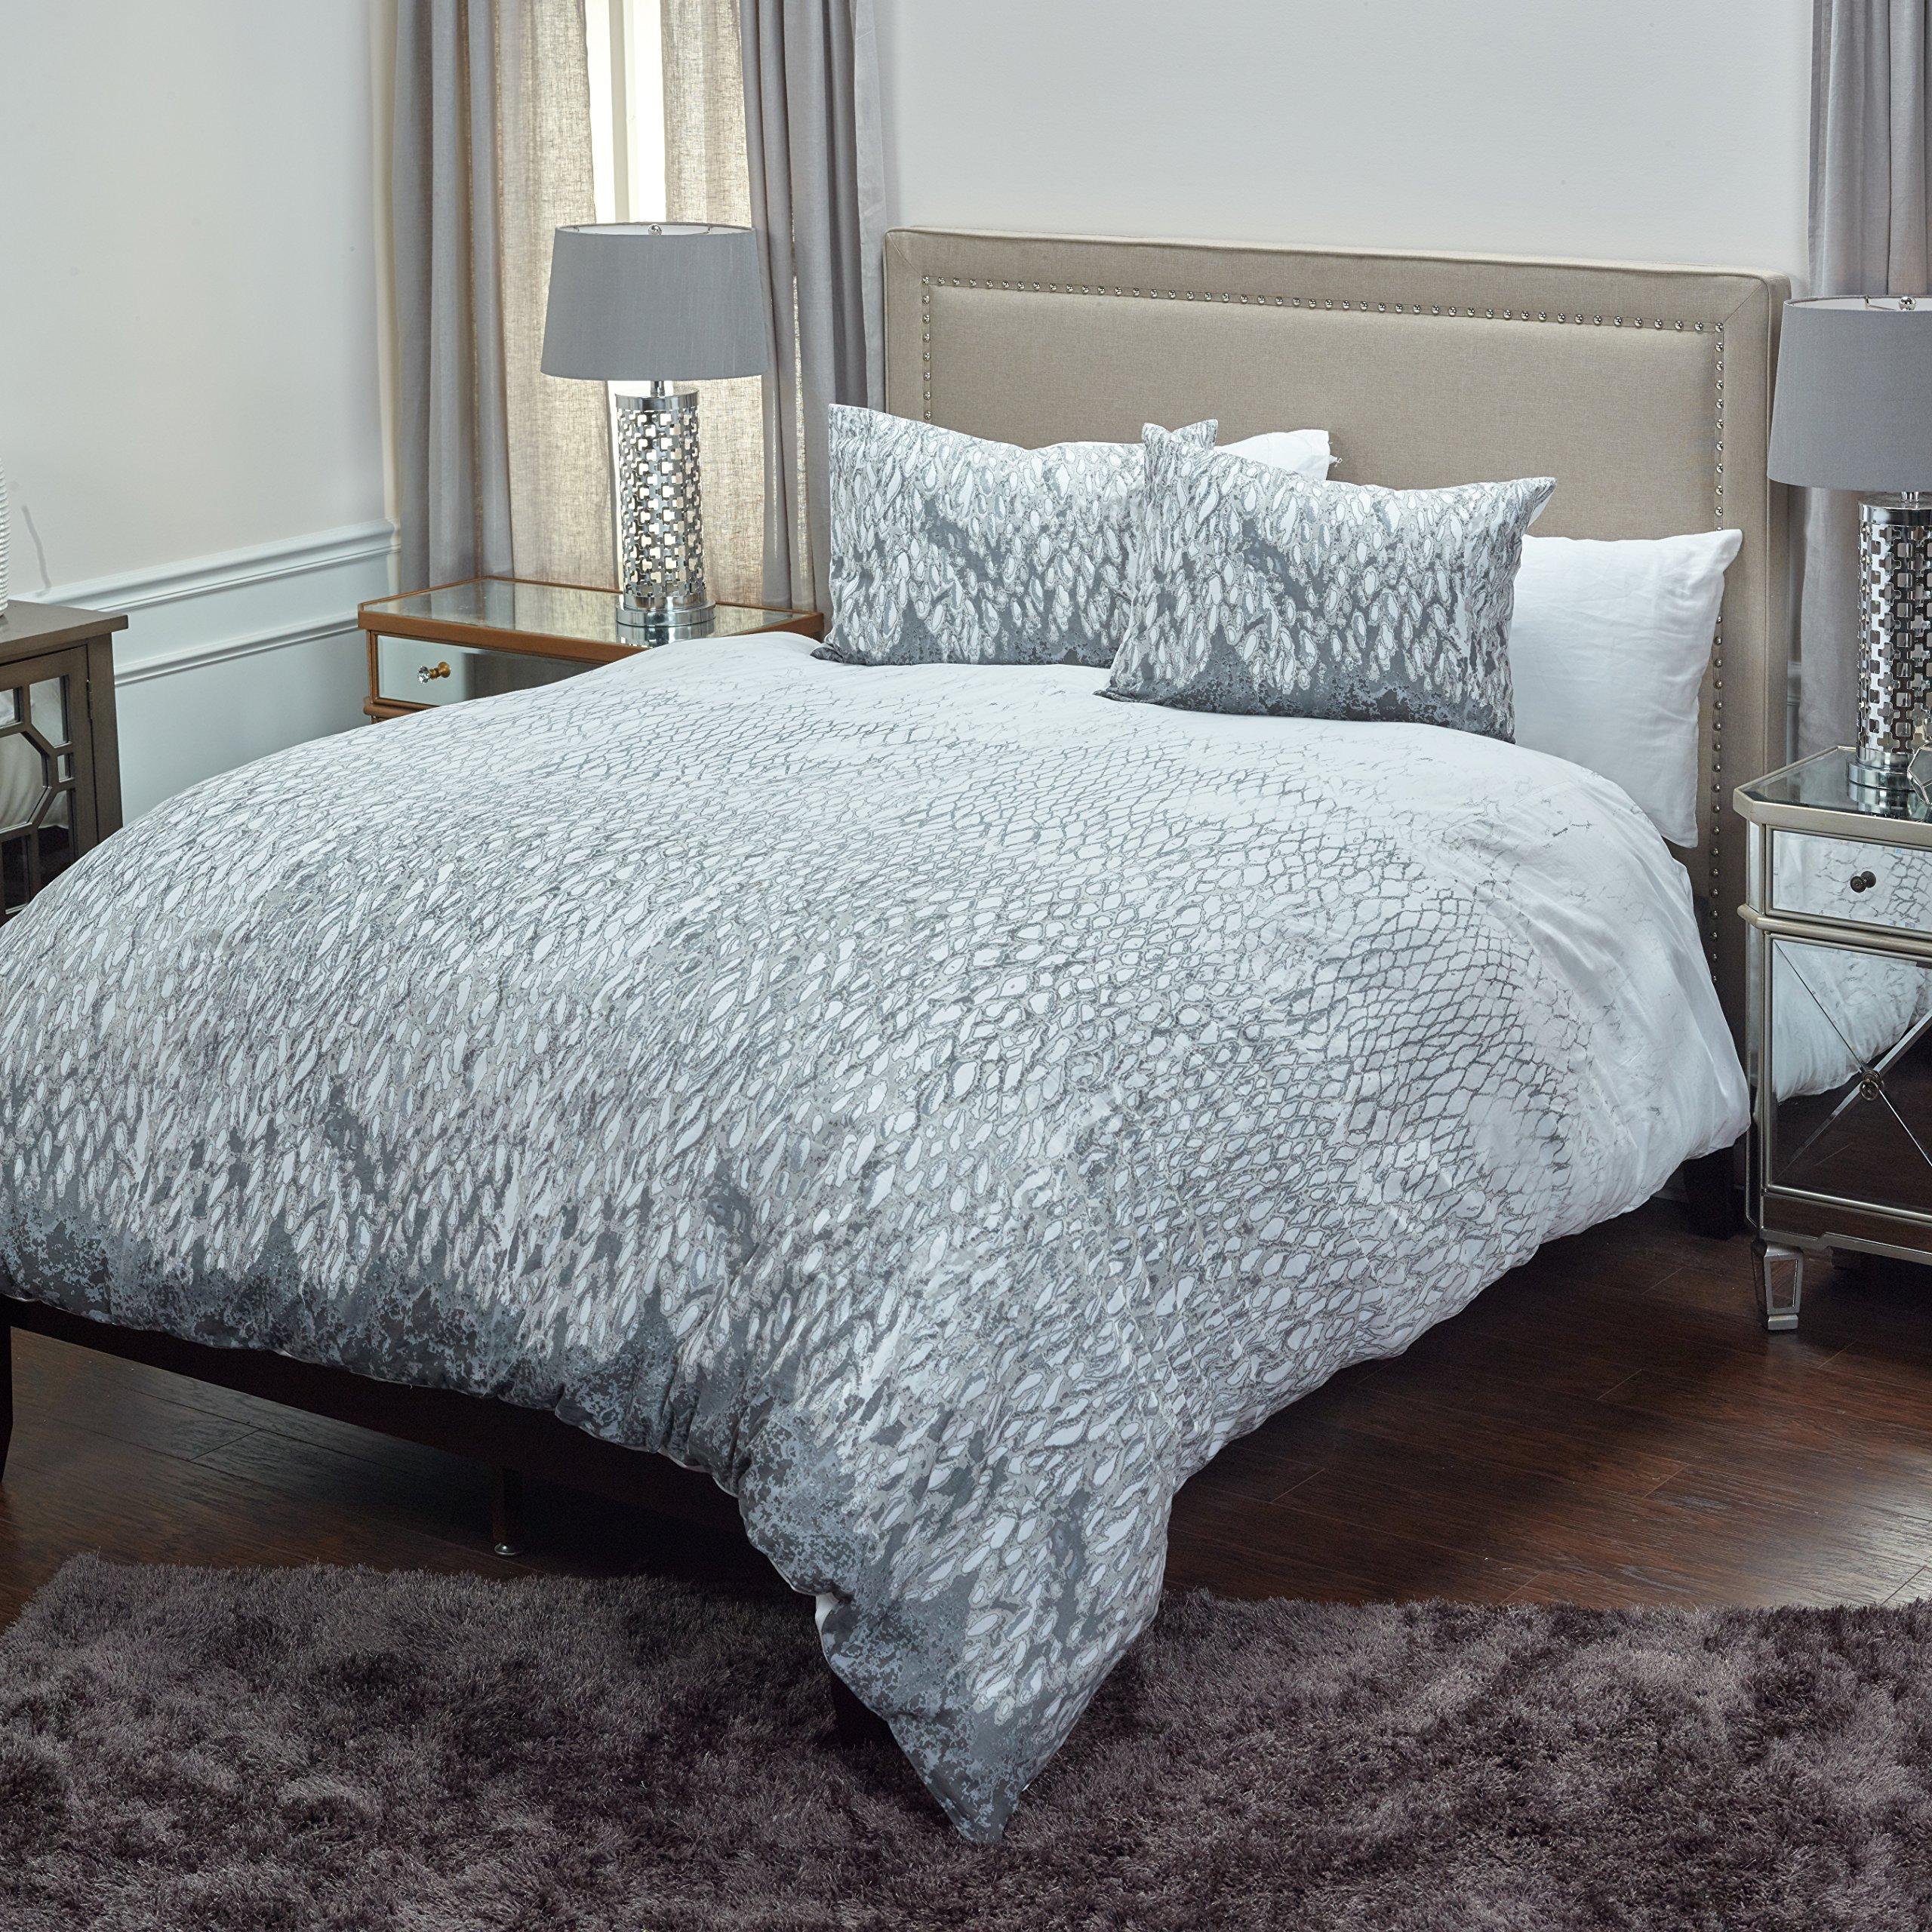 Rizzy Home DFSBT4220WHGY1498 Swank Cotton Duvet Cover Set,White,King